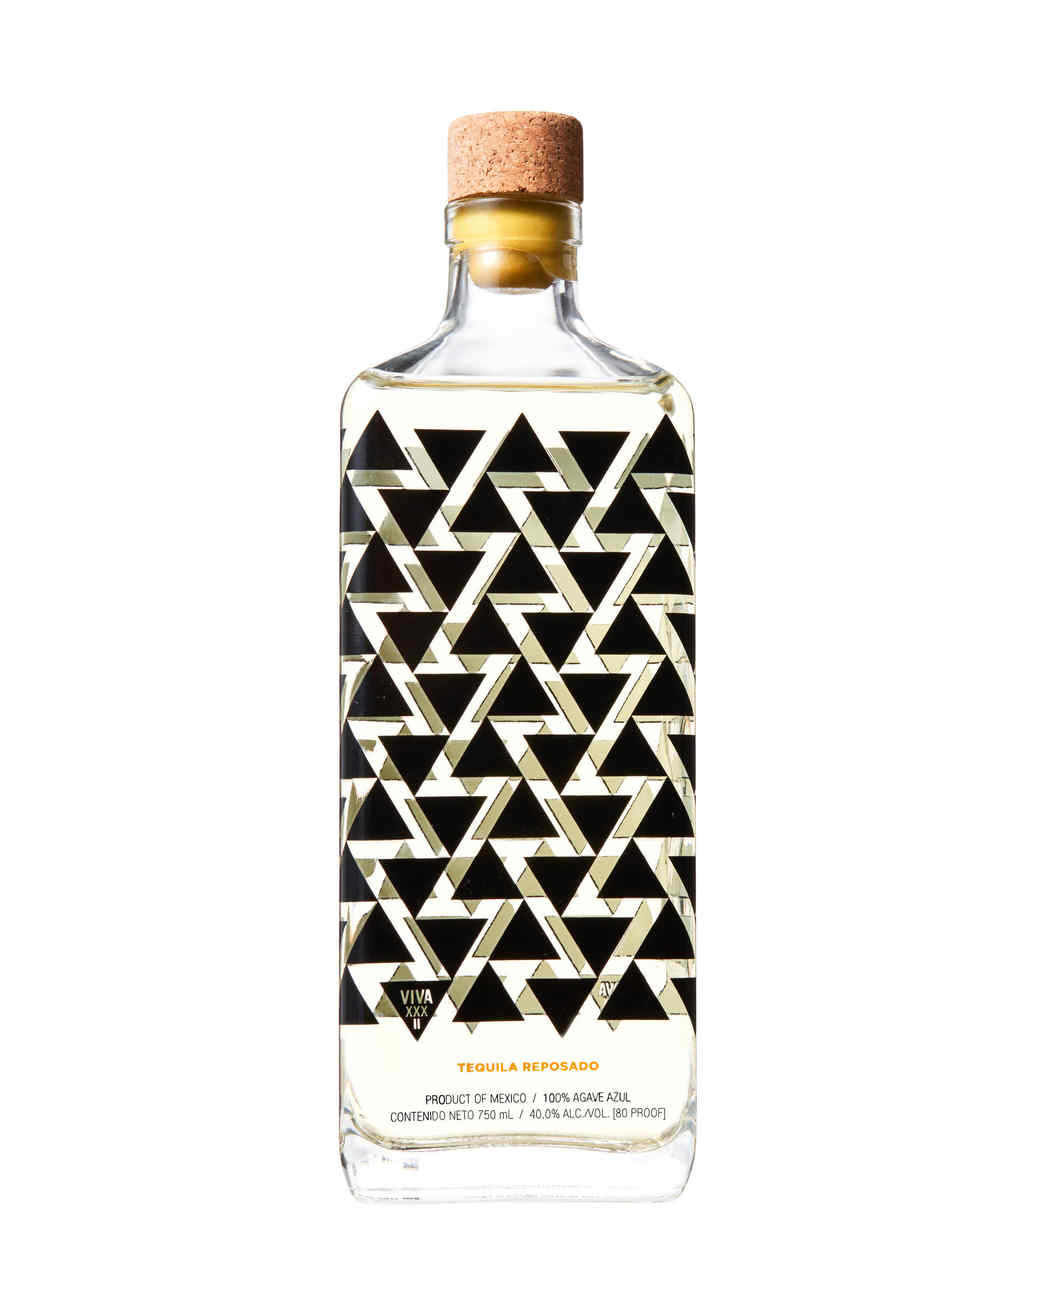 Viva XXXII tequila reposado